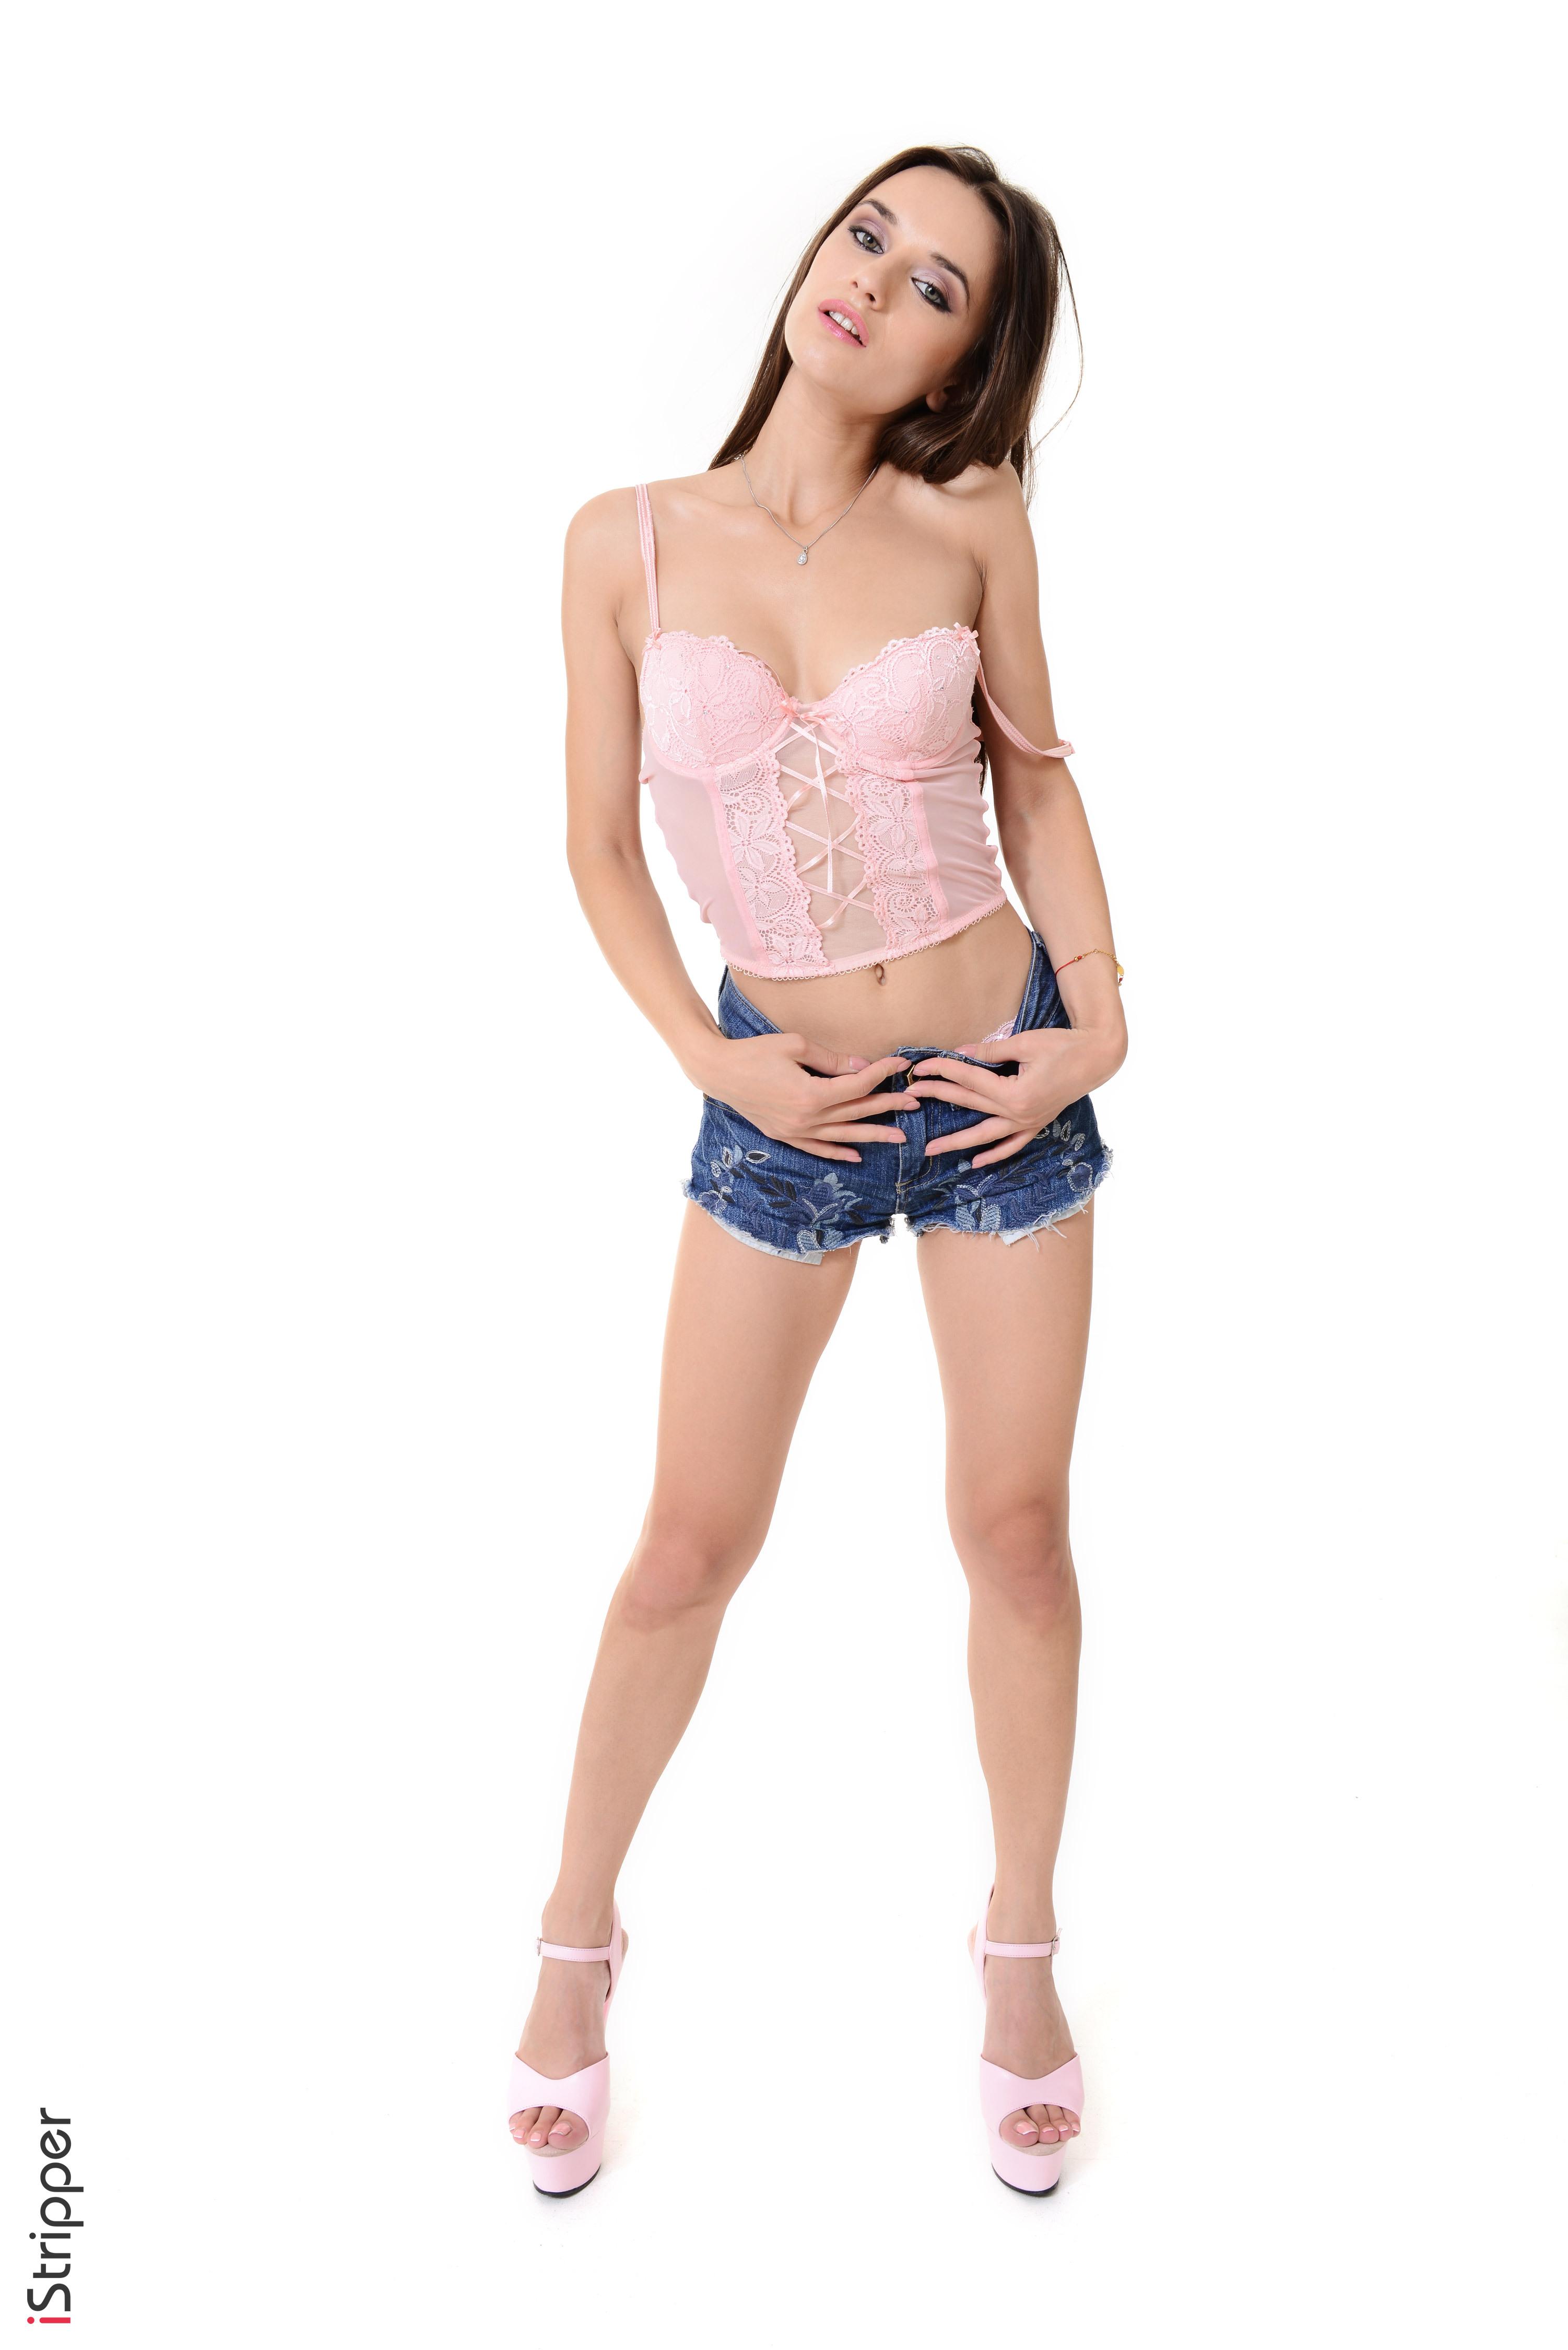 long skirt weared girls stripping images